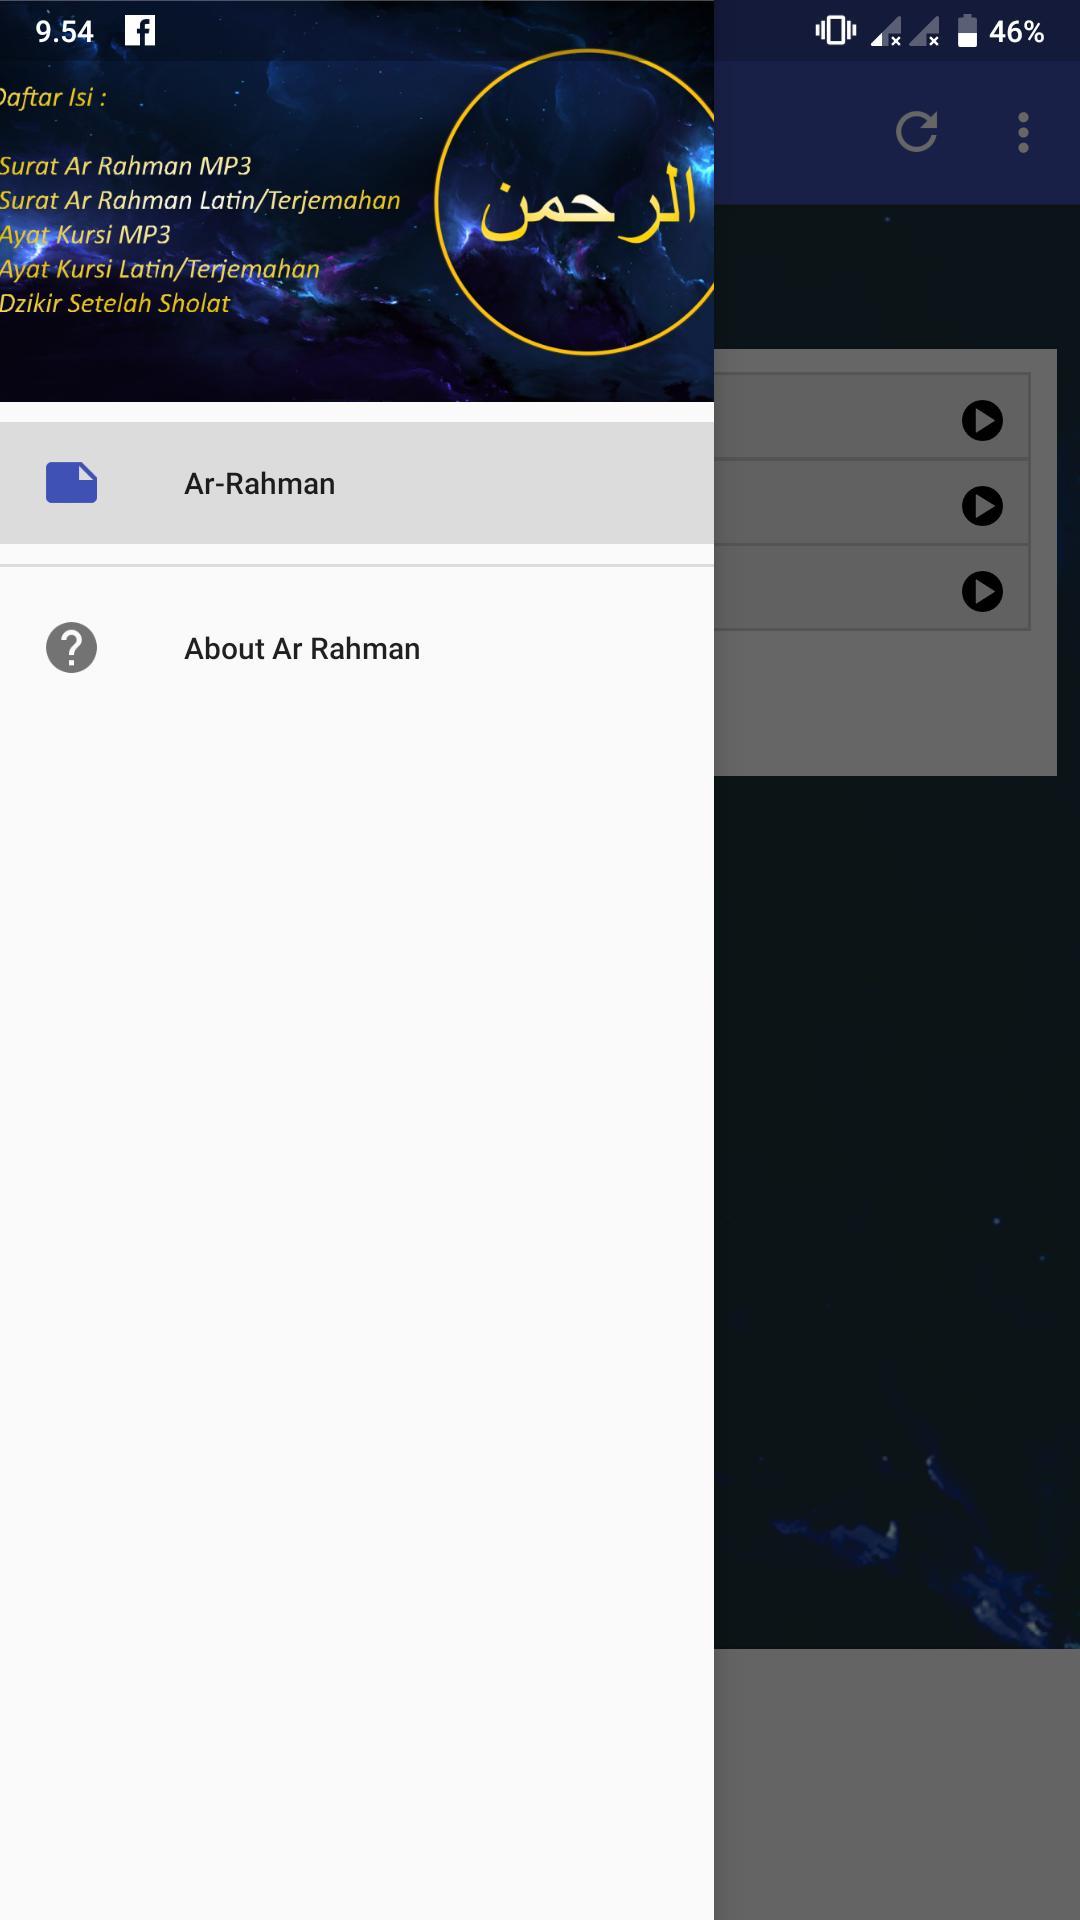 Surat Ar Rahman Latin